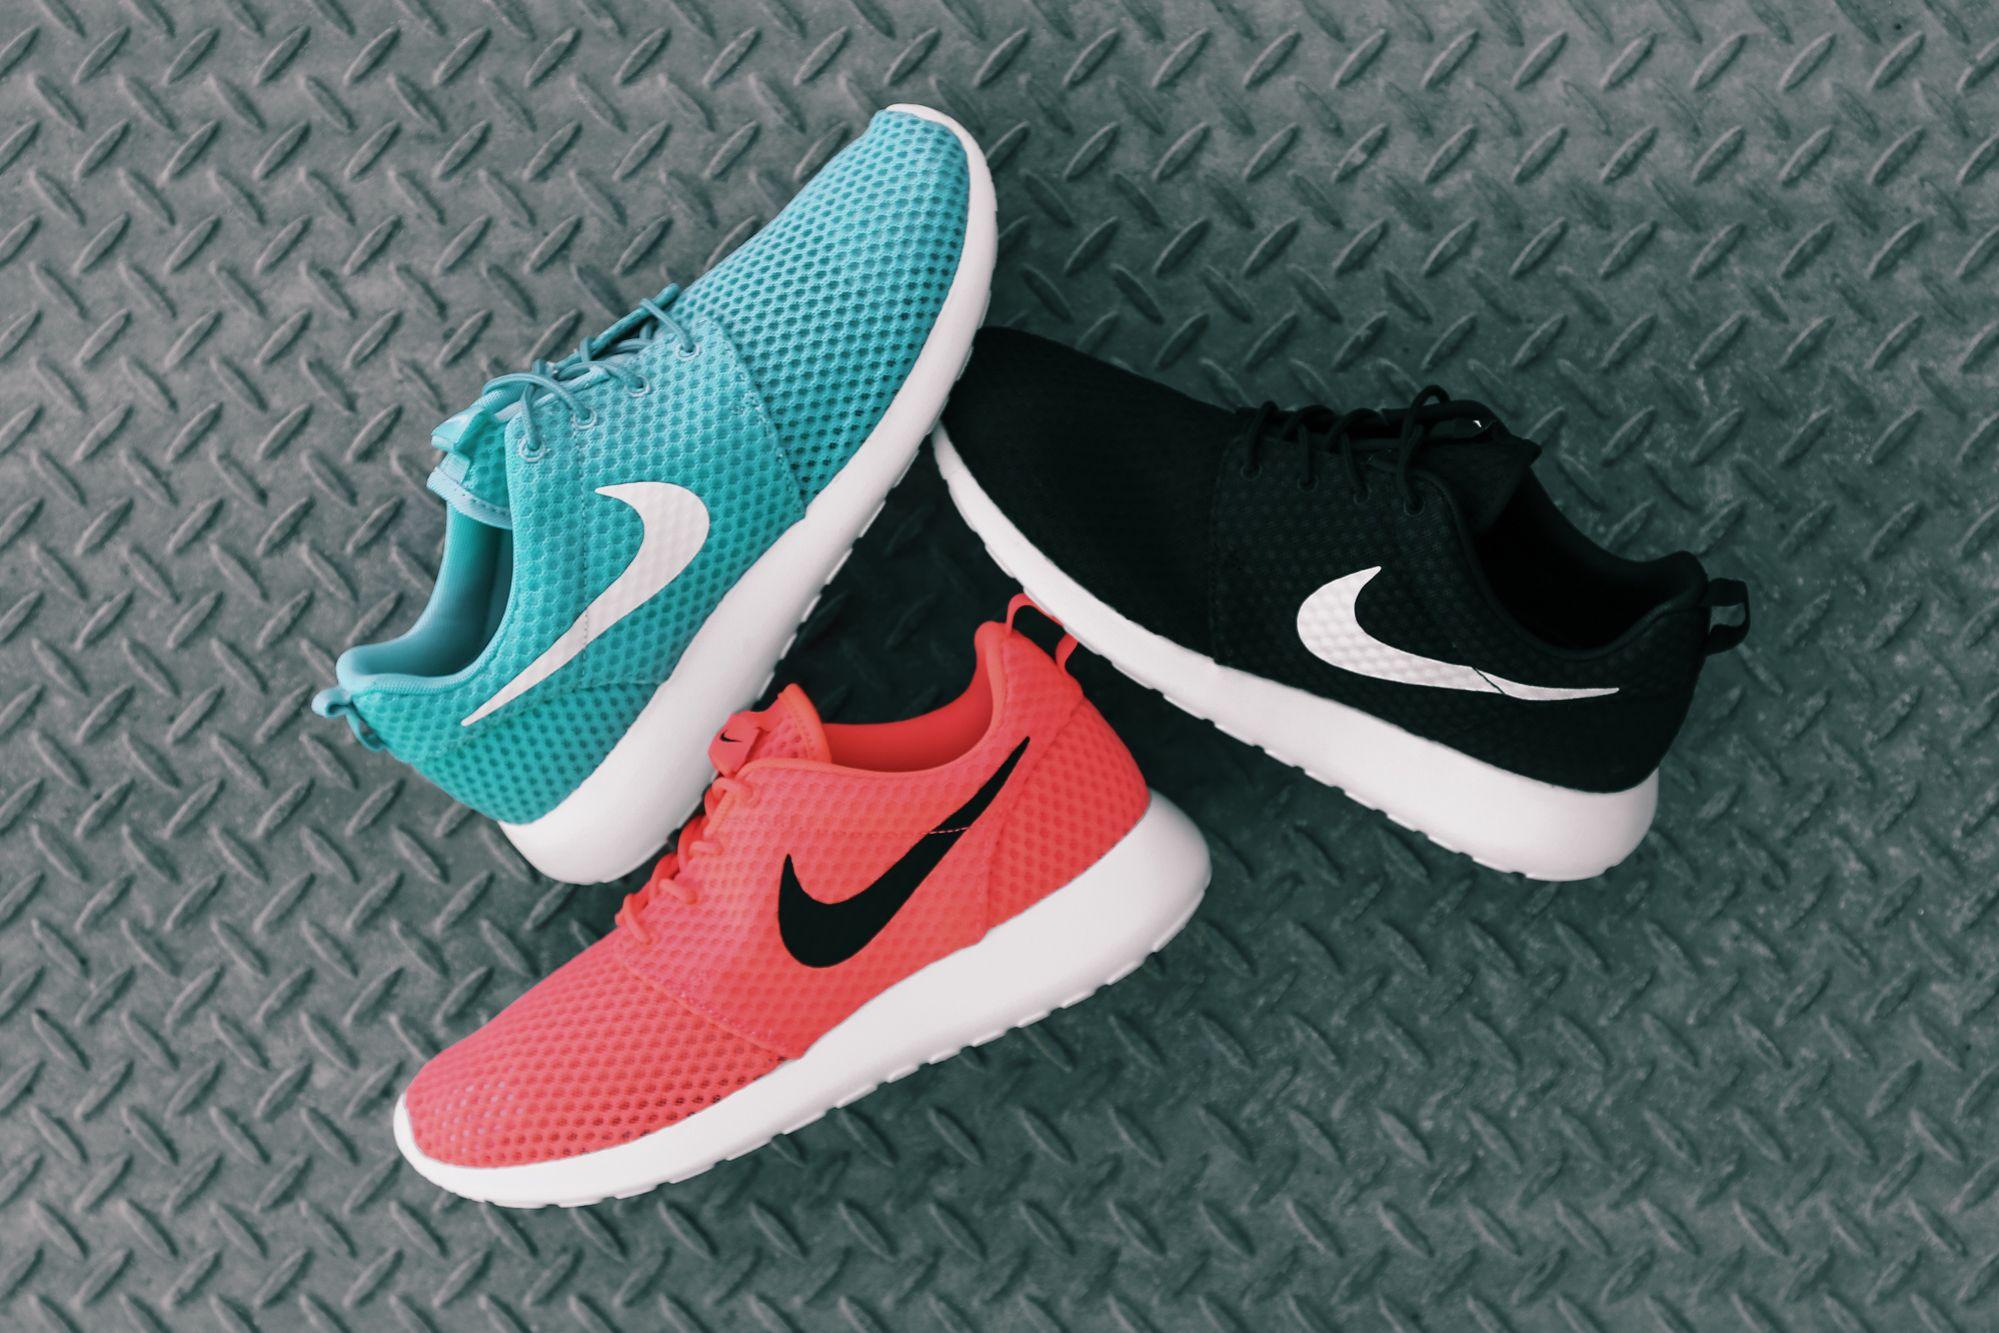 timeless design 6ba11 eef00 Horoscope FREE Reading on in 2019   nike   Nike shoes, Running shoes nike,  Nike basketball shoes